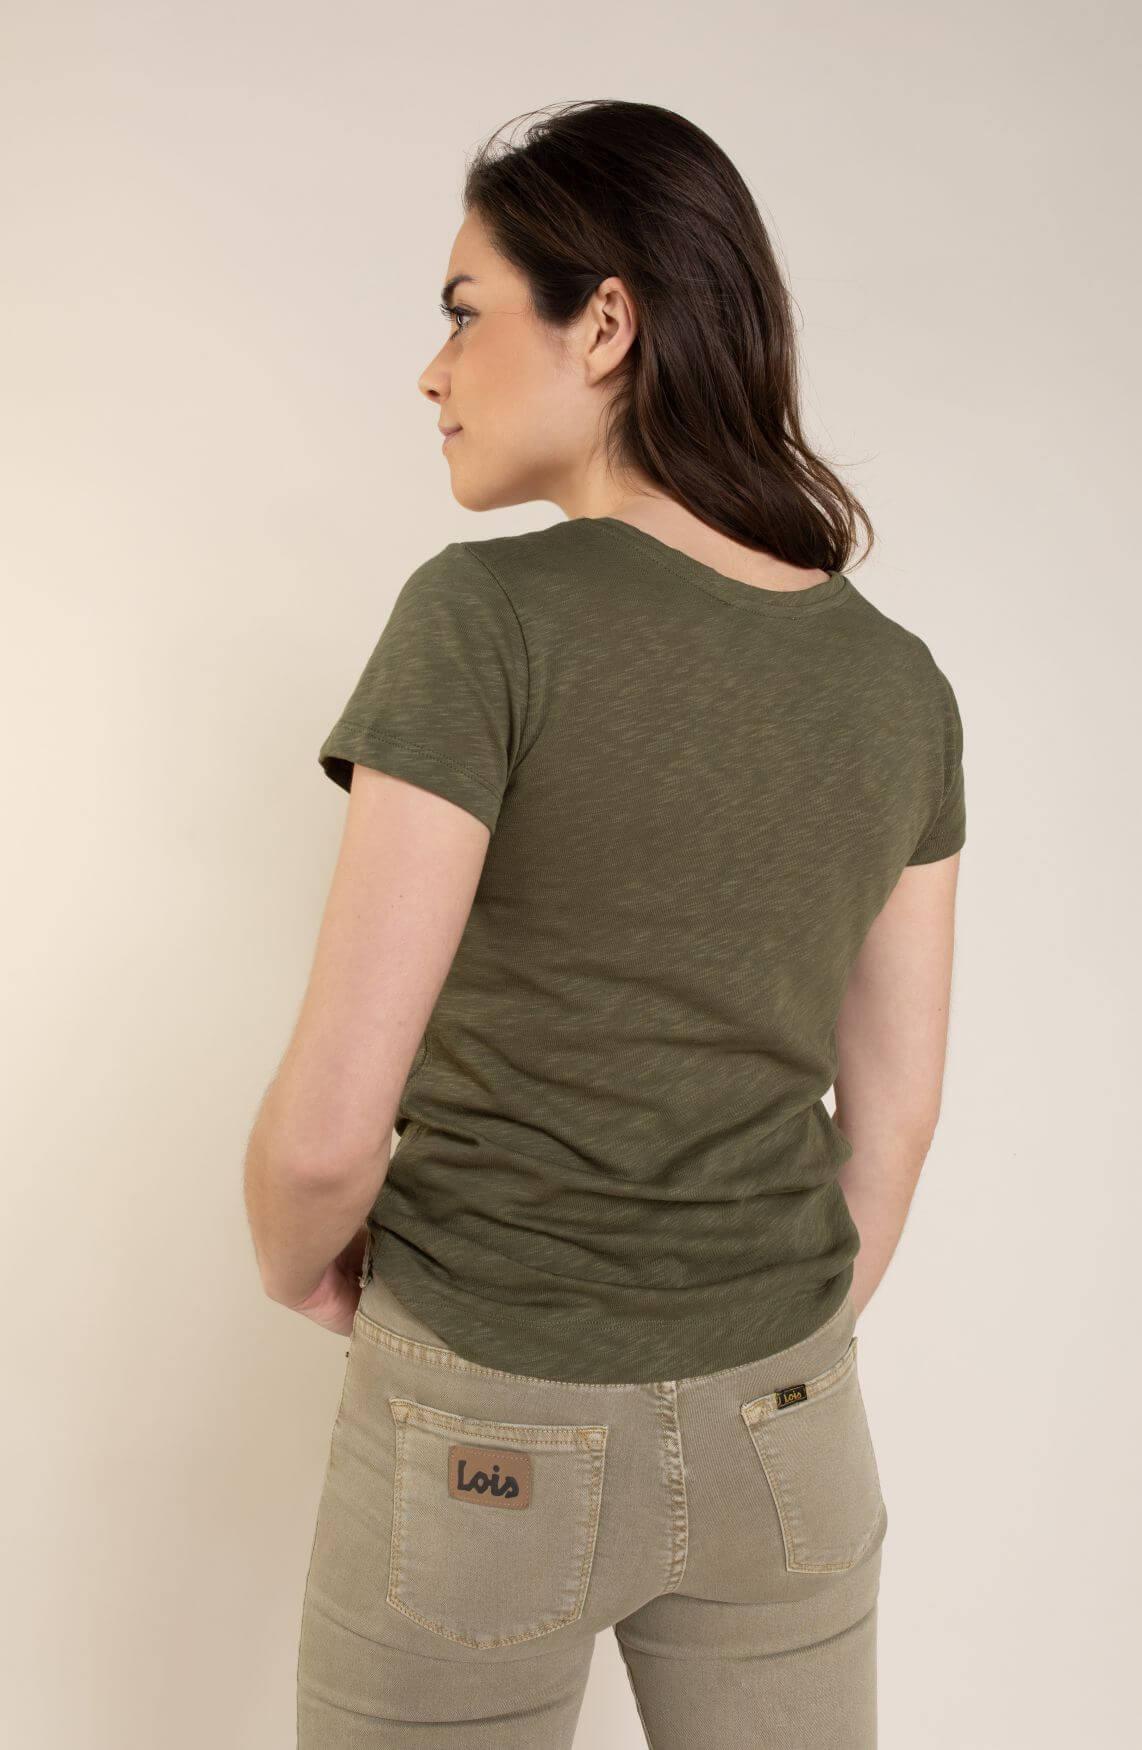 Mos Mosh Dames Marple shirt Groen